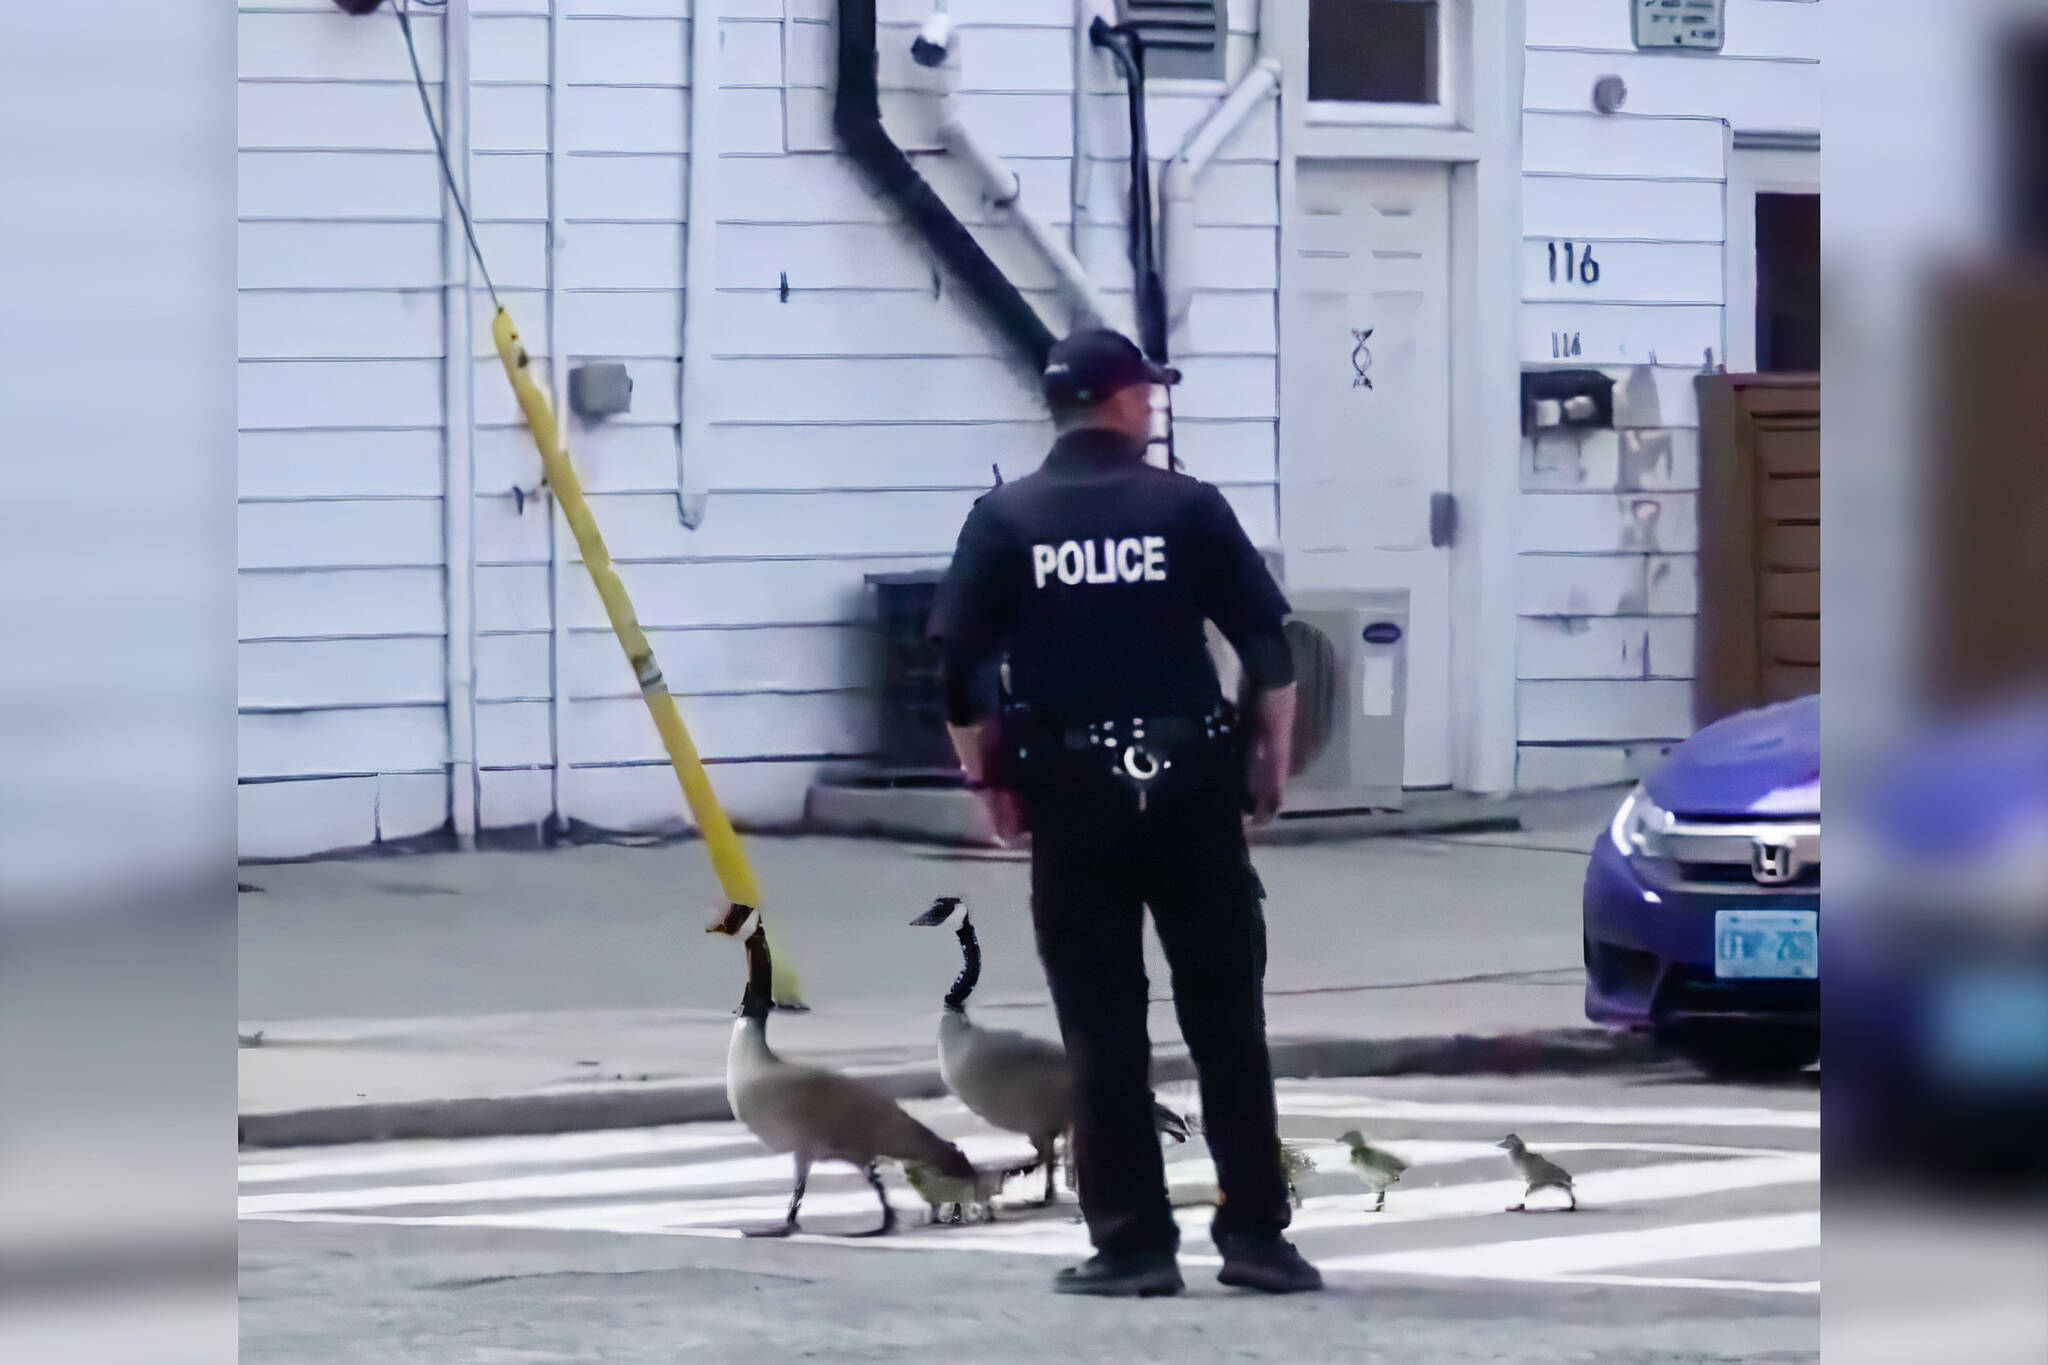 toronto geese crossing